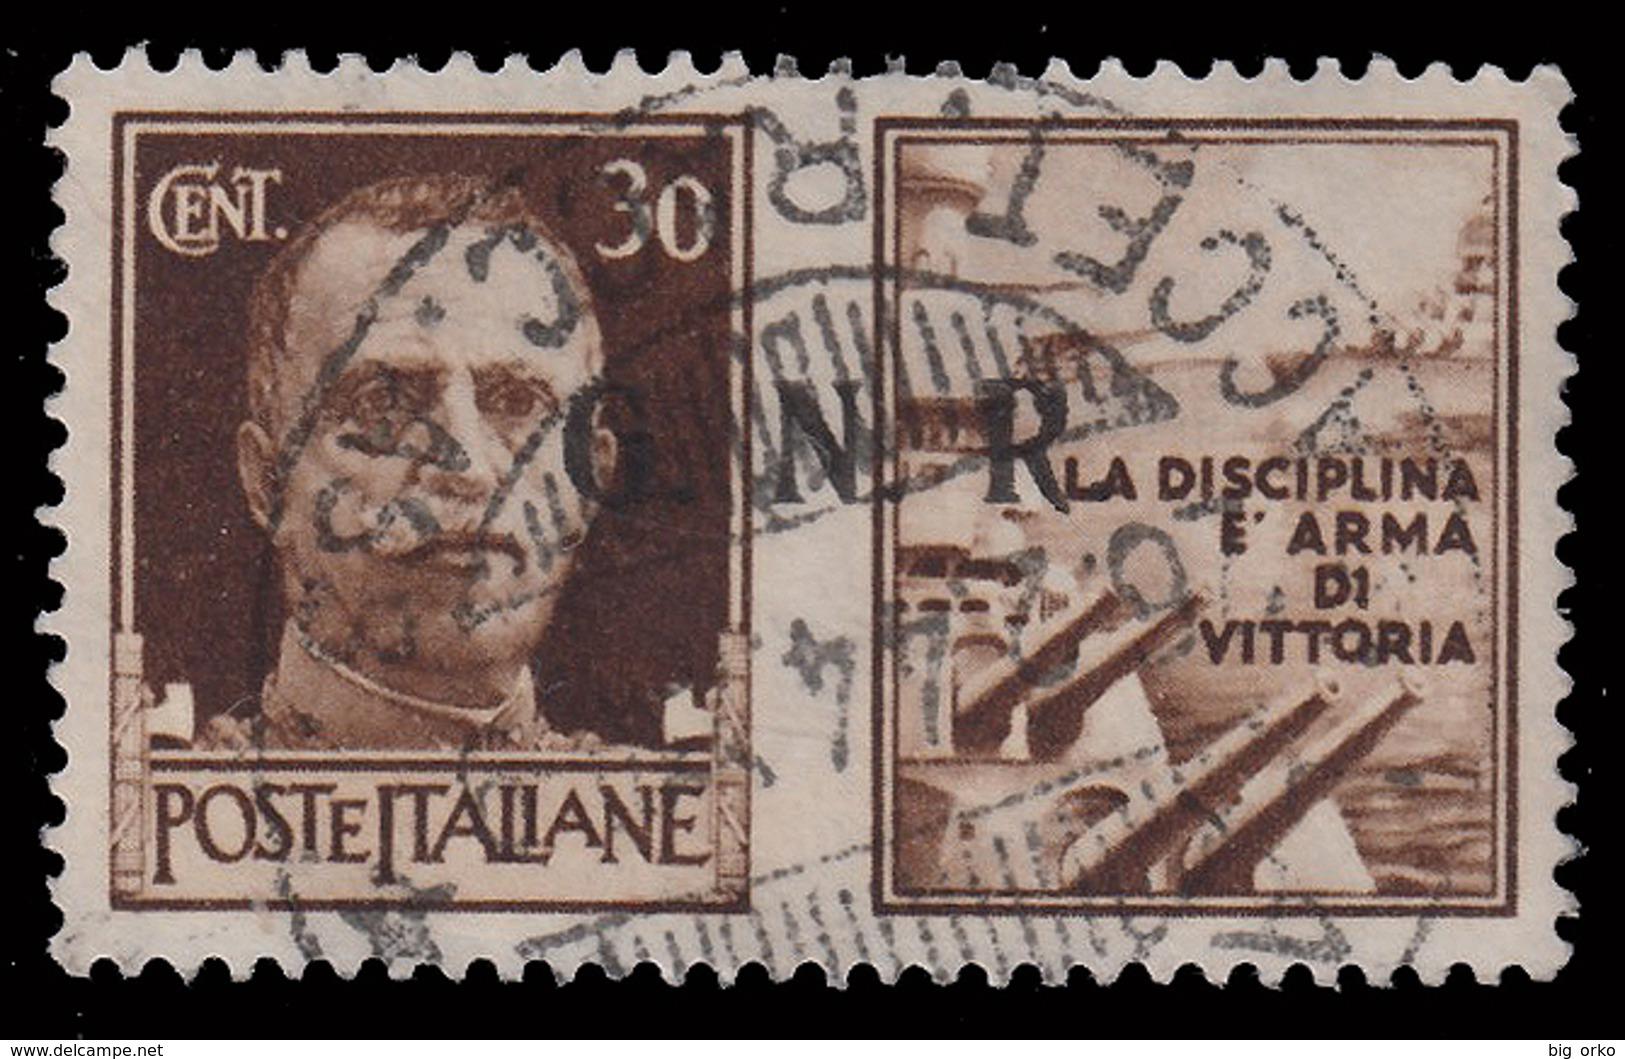 Italia: R.S.I. - PROPAGANDA DI GUERRA / G.N.R.: 30 C. Bruno (I - Marina) - 1944 - 4. 1944-45 Repubblica Sociale